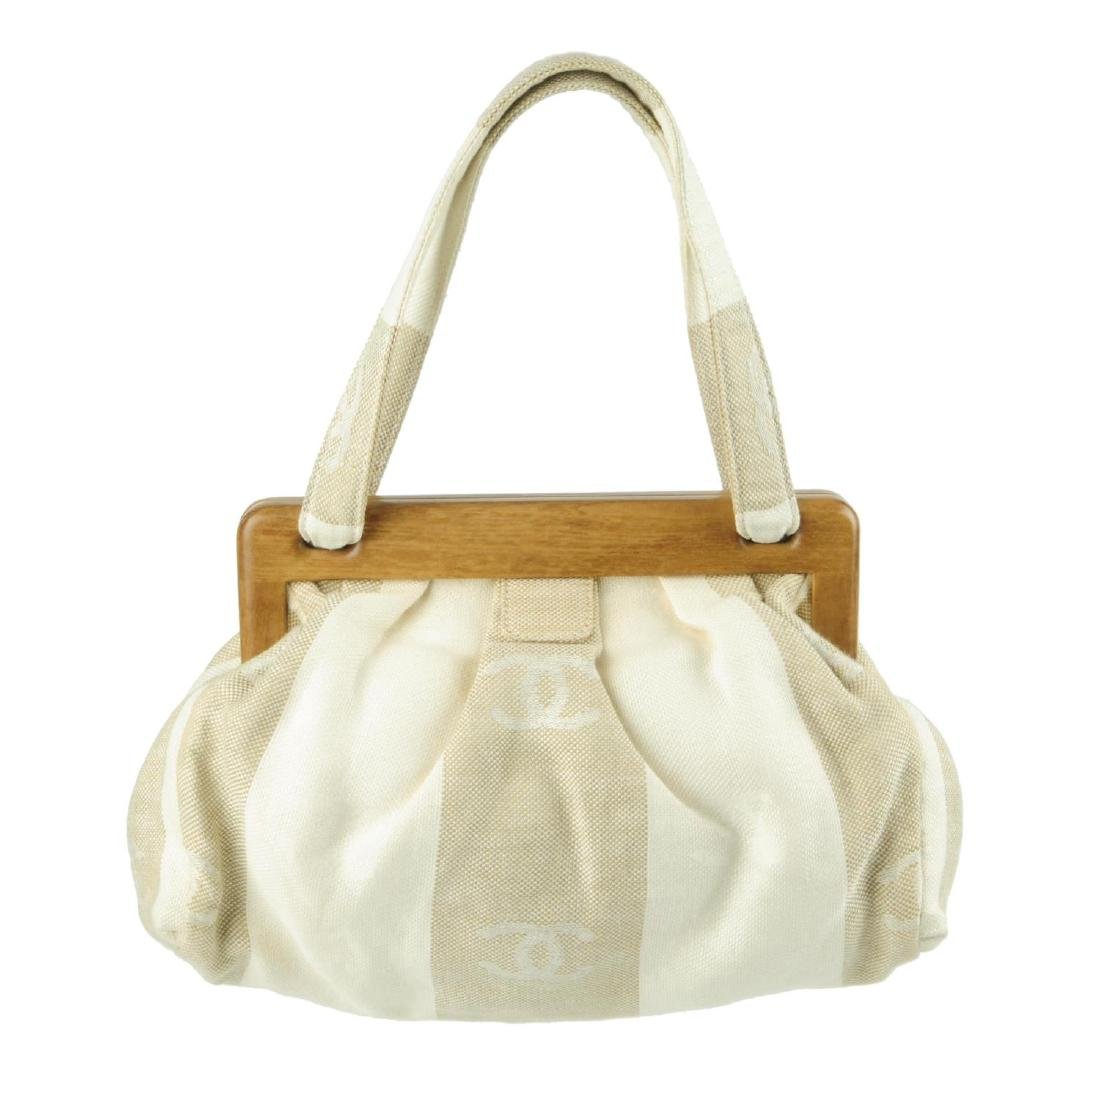 CHANEL - a white and beige canvas handbag. Designed